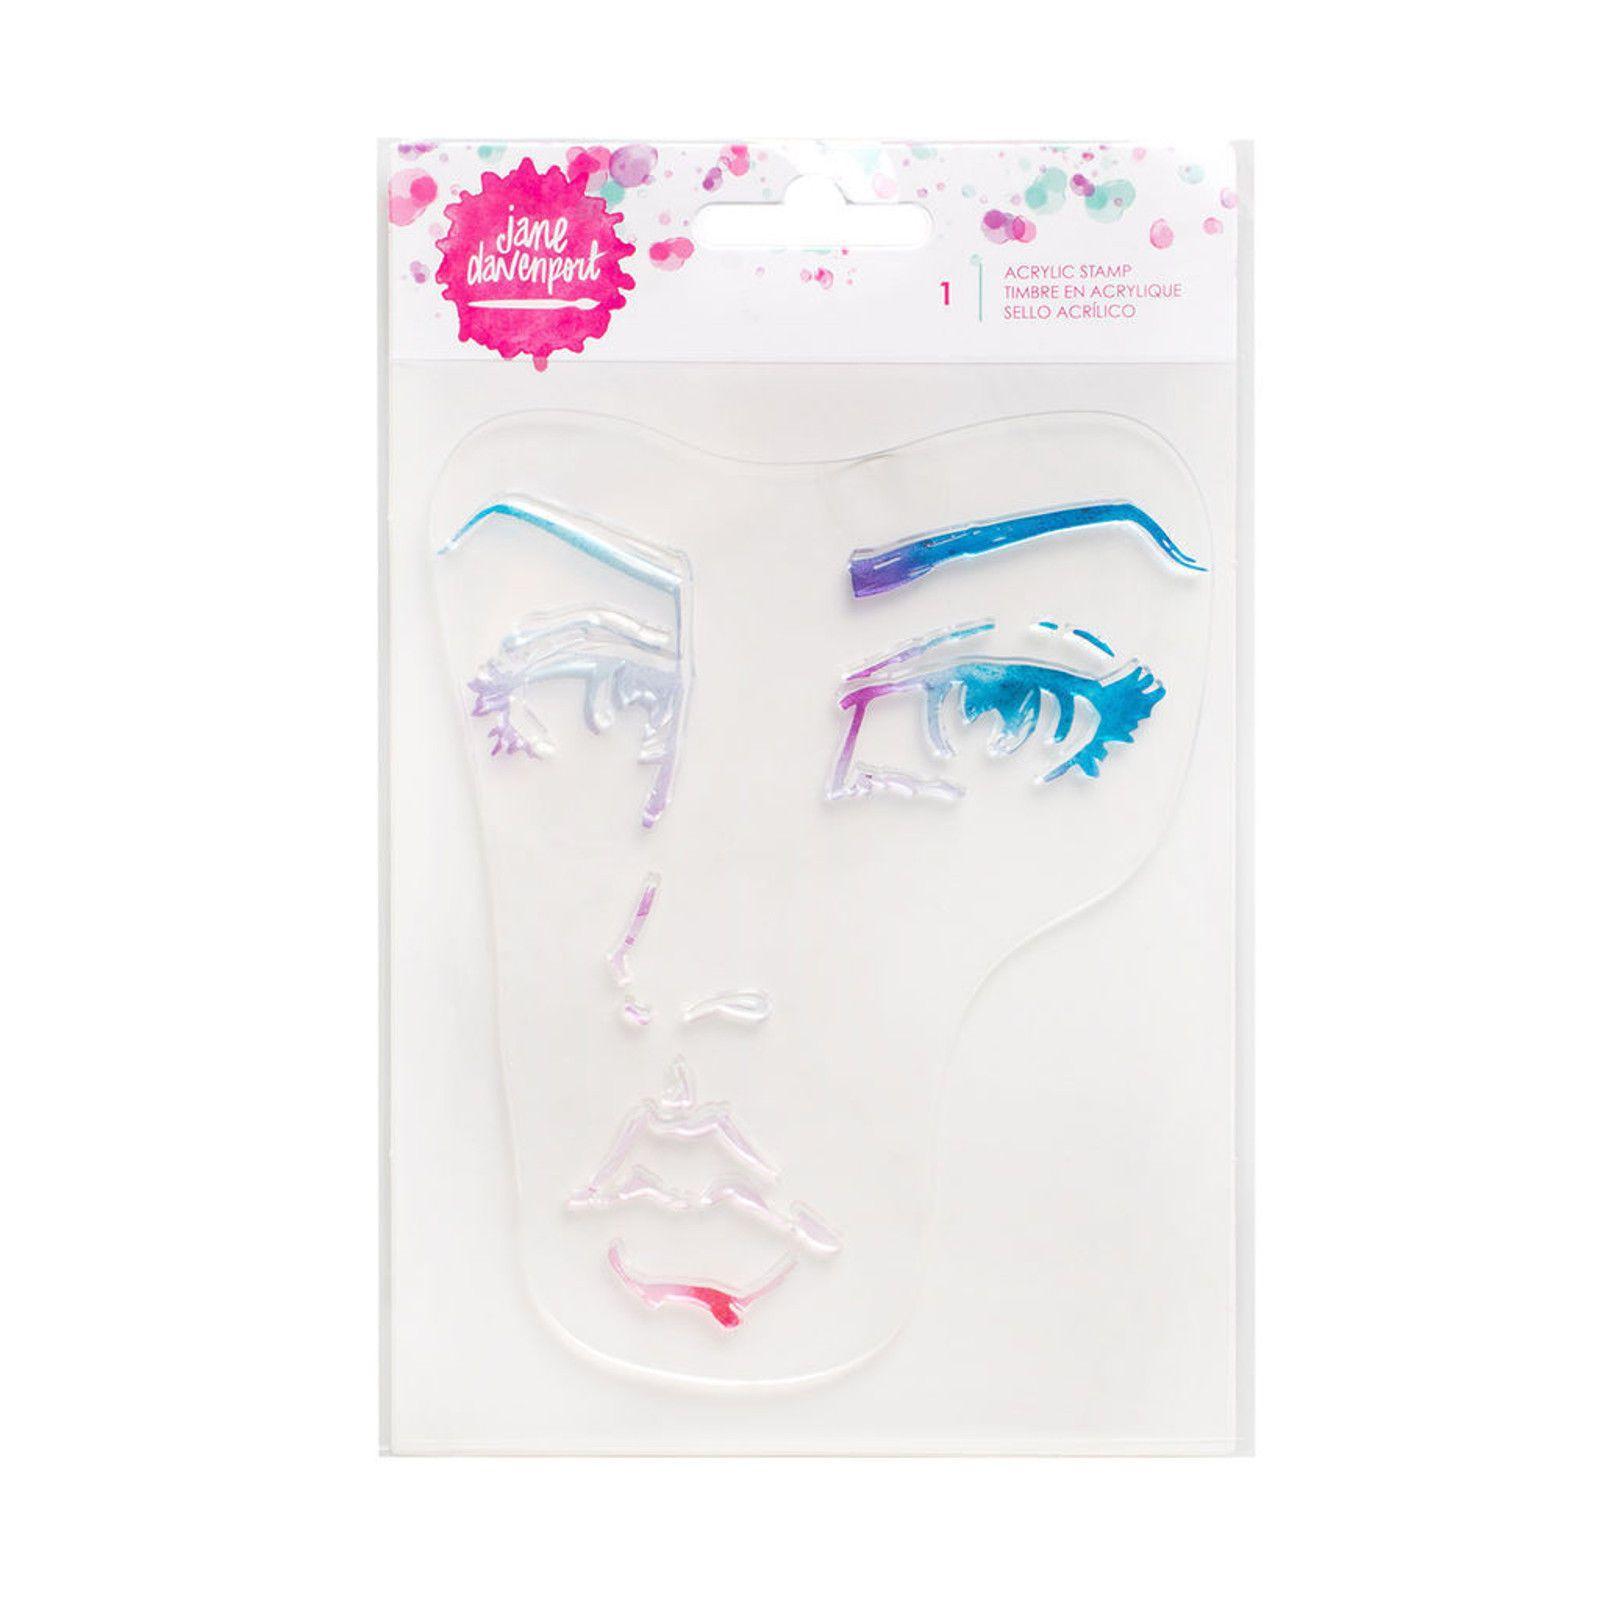 Spellbinders Jane Davenport Stencils-Good Face 7 x 8-inch